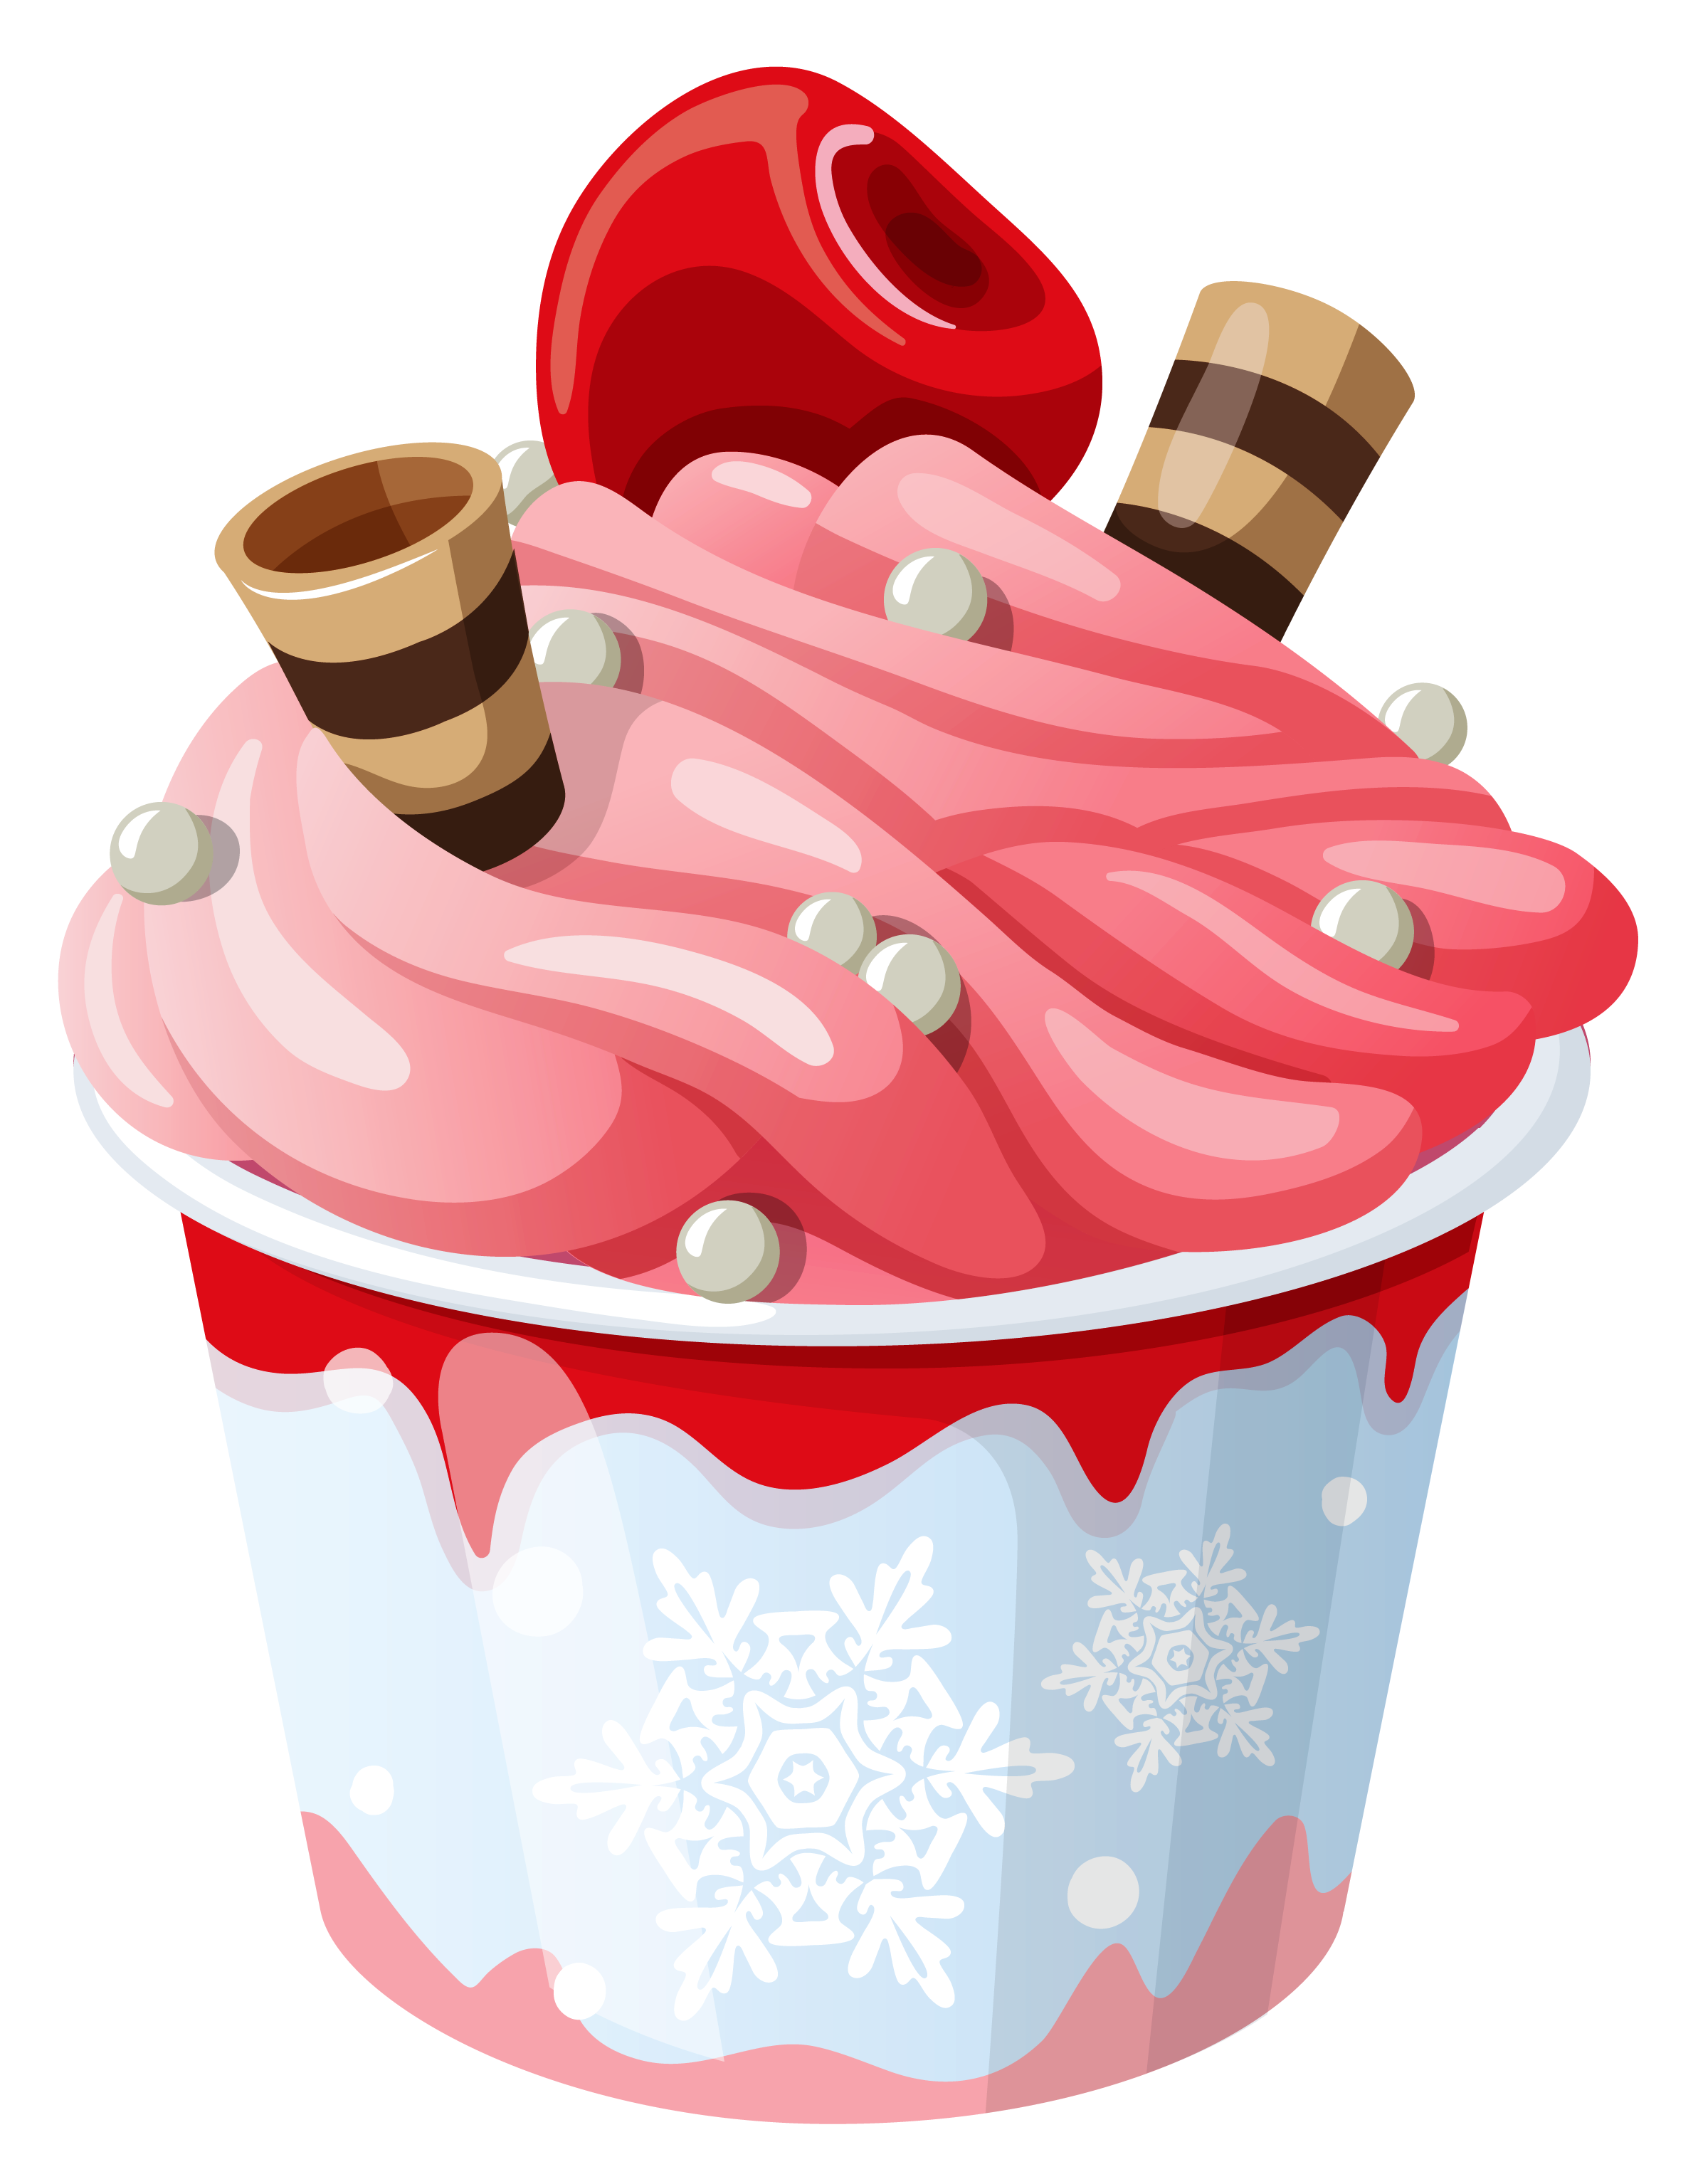 Ice Cream Cone Strawberry Ice Cream Png Chocolate Ice Cream Clipart Cream Dairy Product Dessert Ice Cream Cartoon Ice Cream Illustration Ice Cream Cone